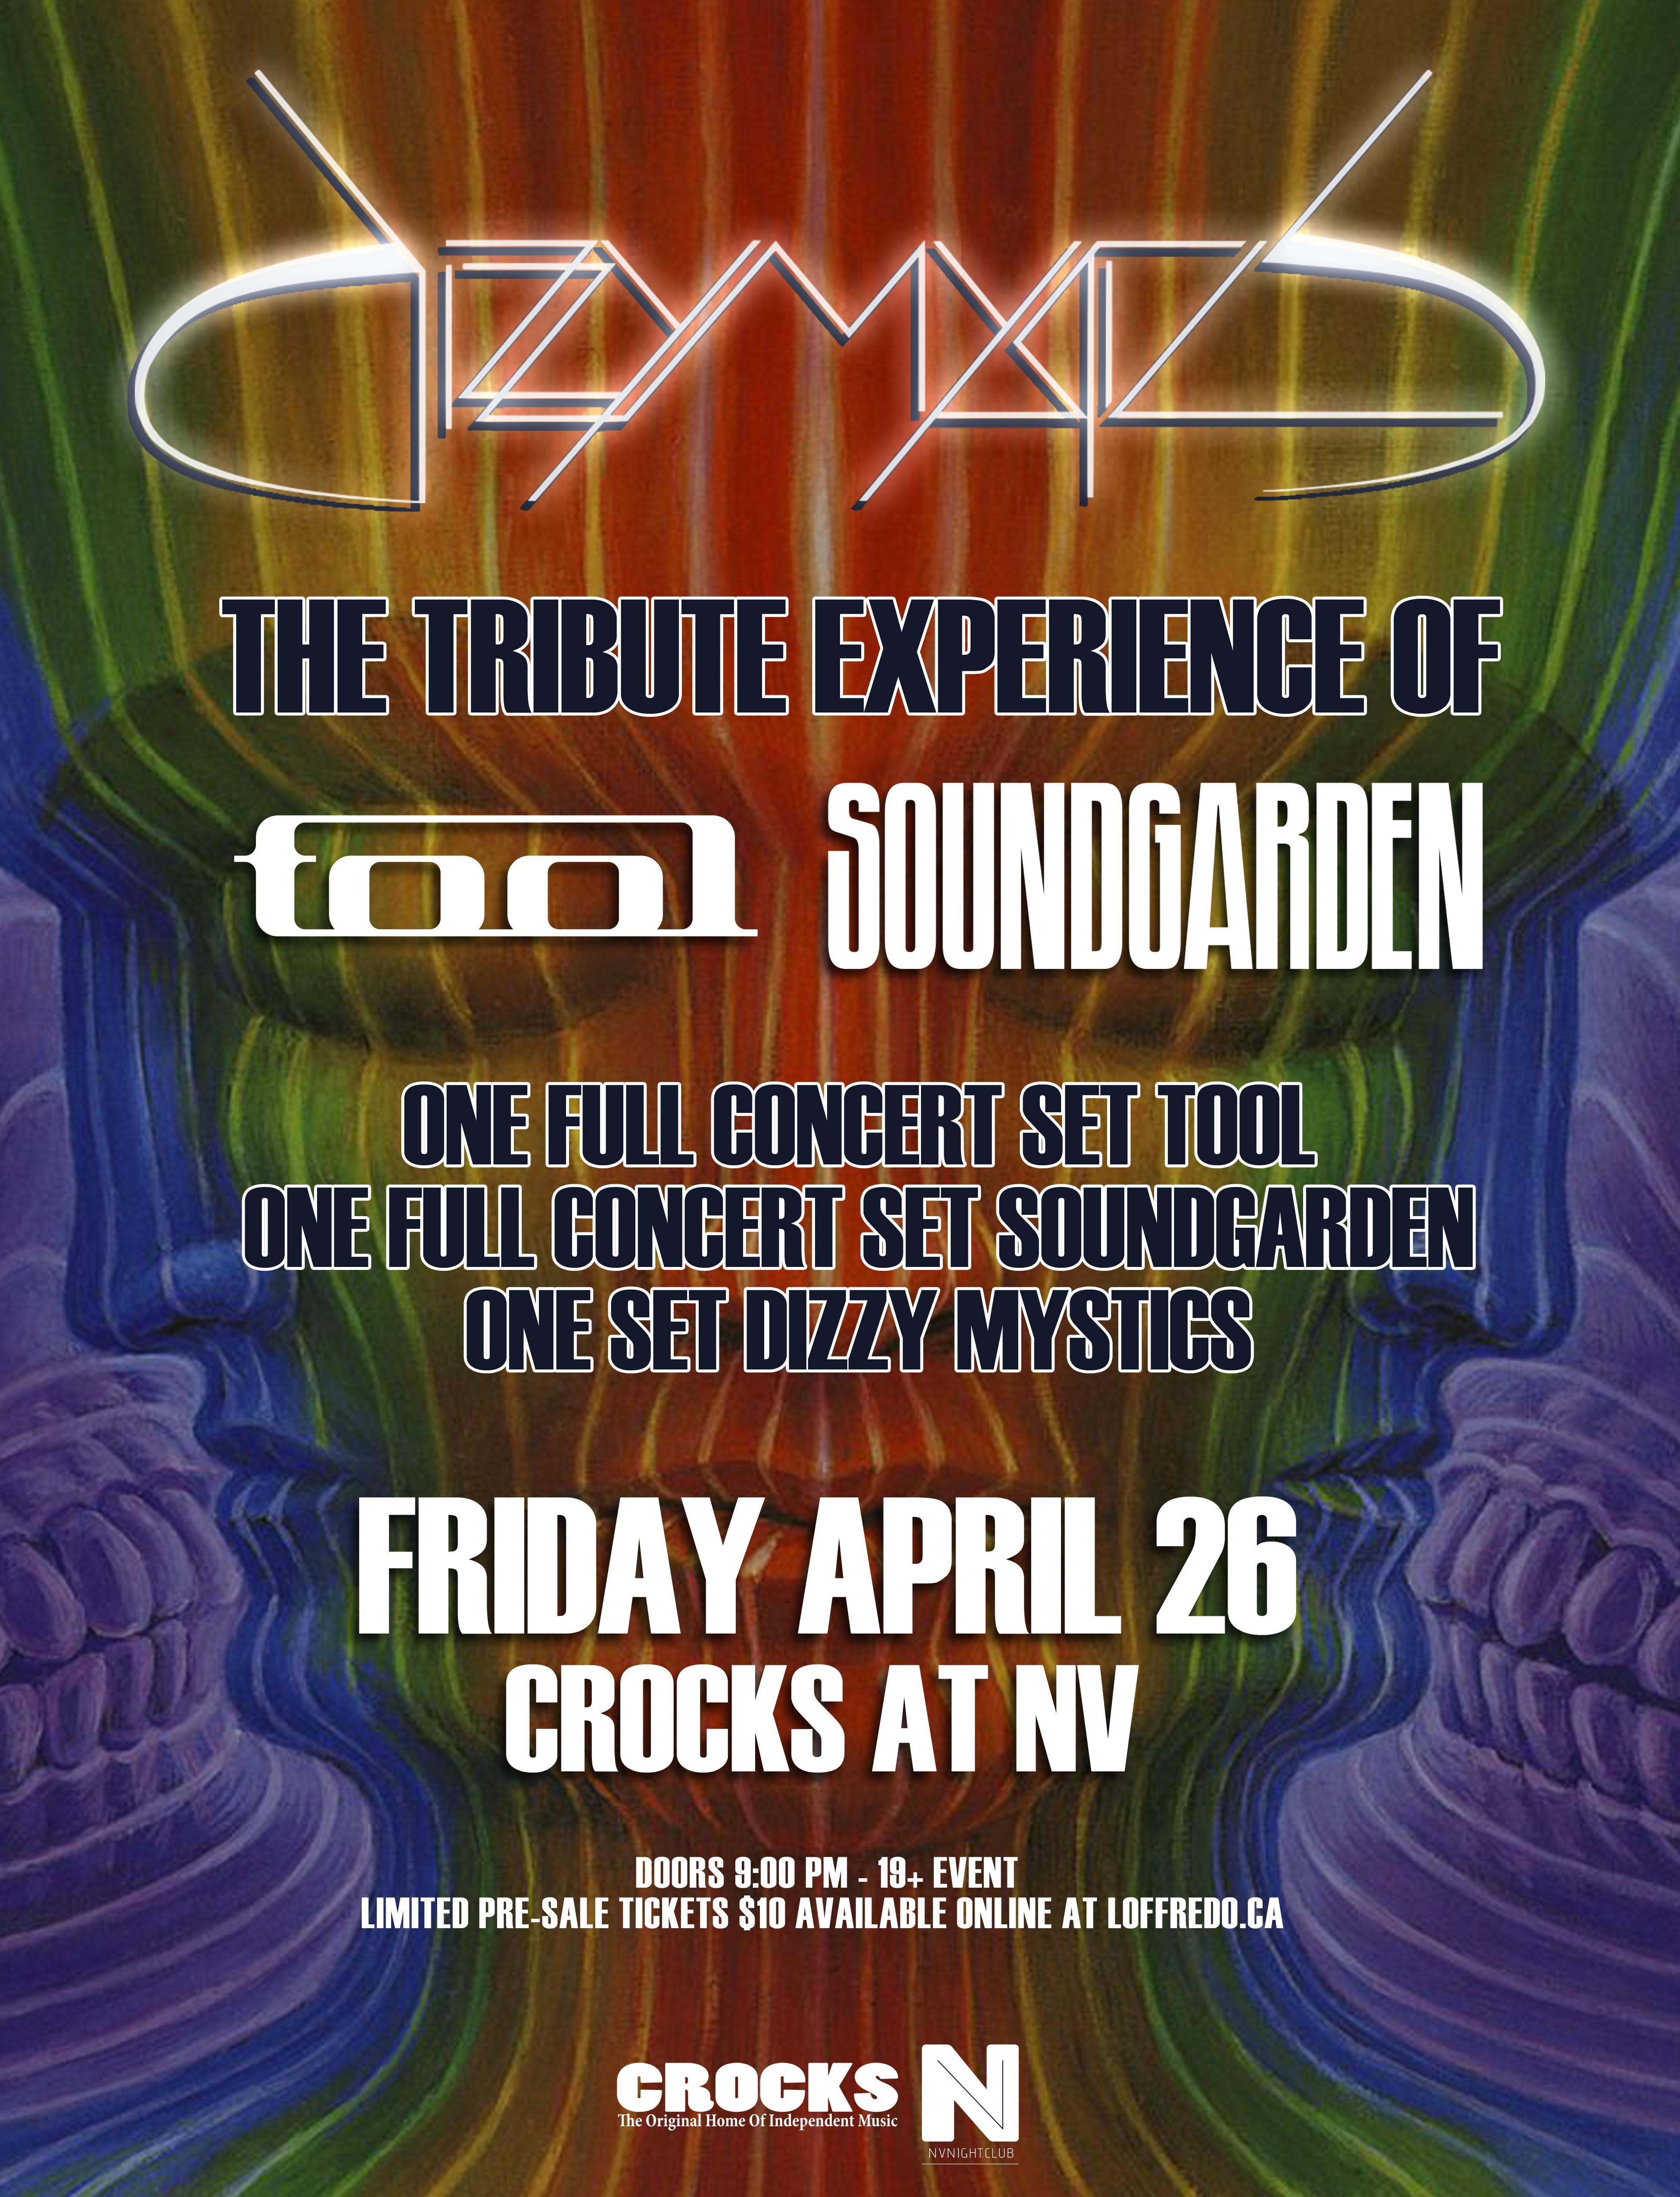 Dizzy Mystics - Ultimate Soundgarden & Tool Tribute Experience - April 26 00294